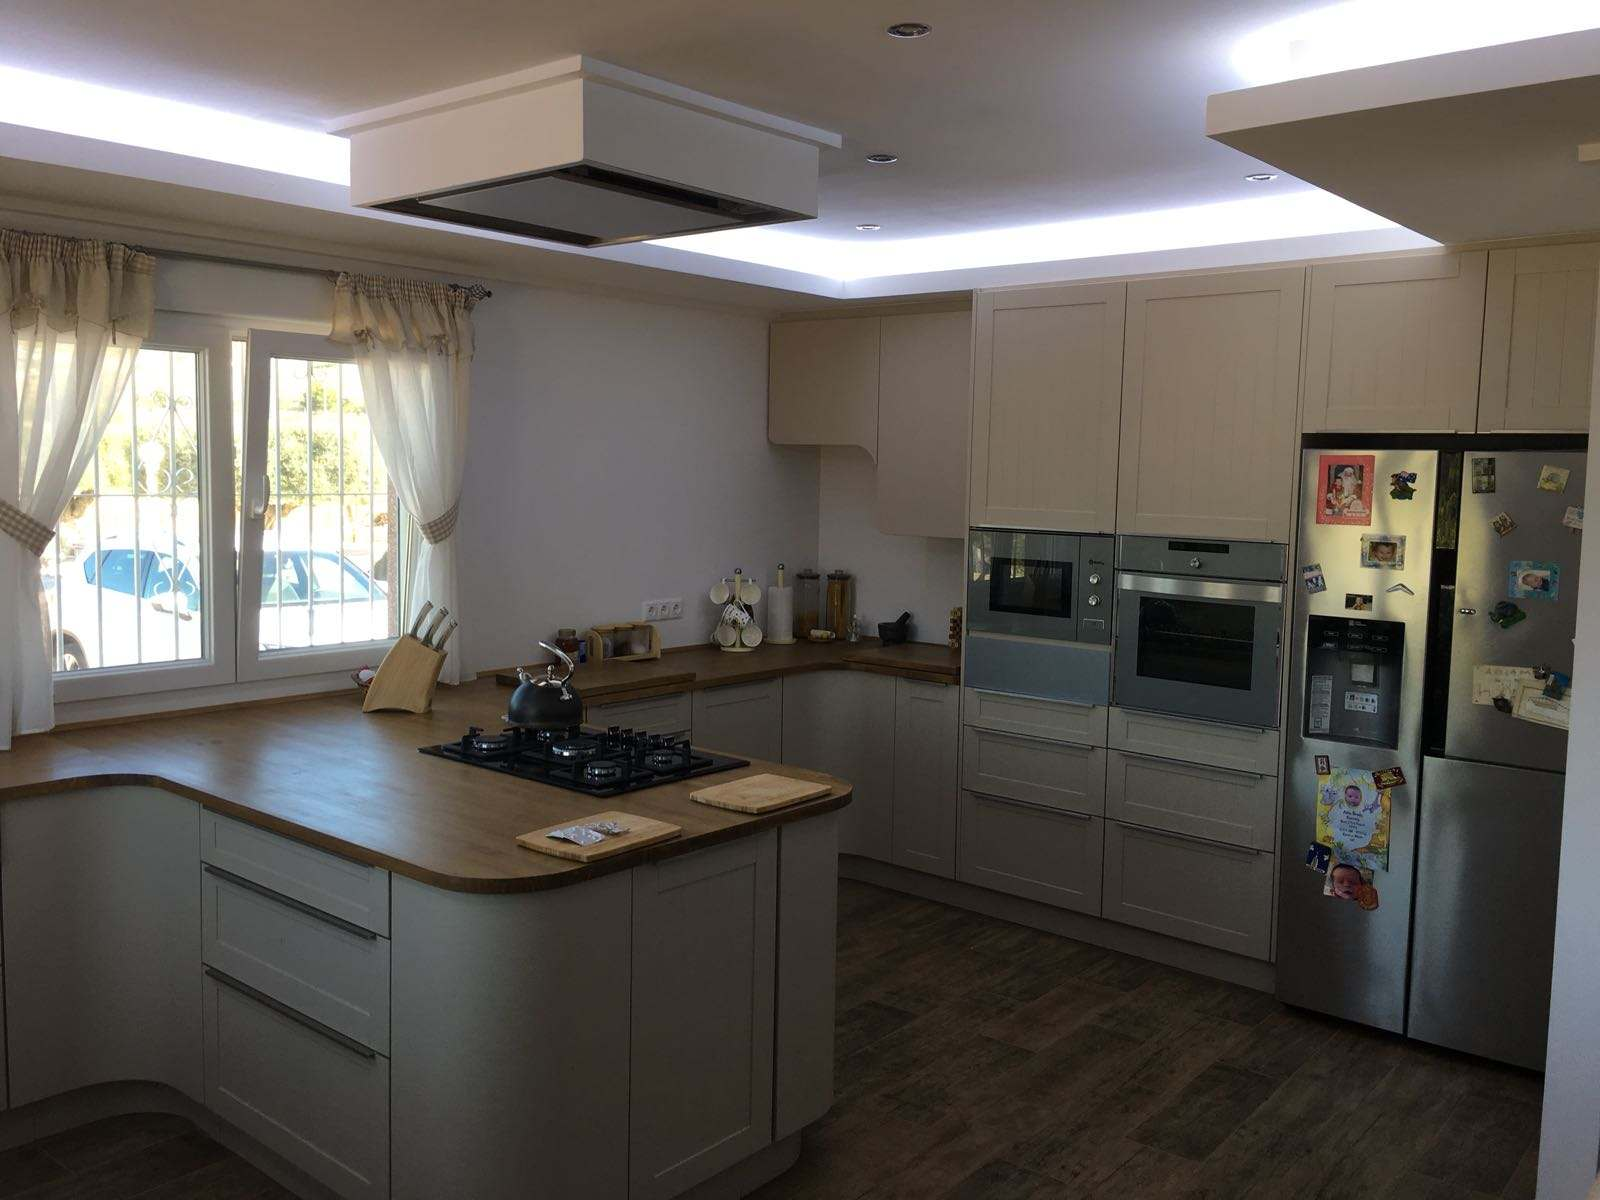 full-kitchen-renovation-leddy-contractors-10